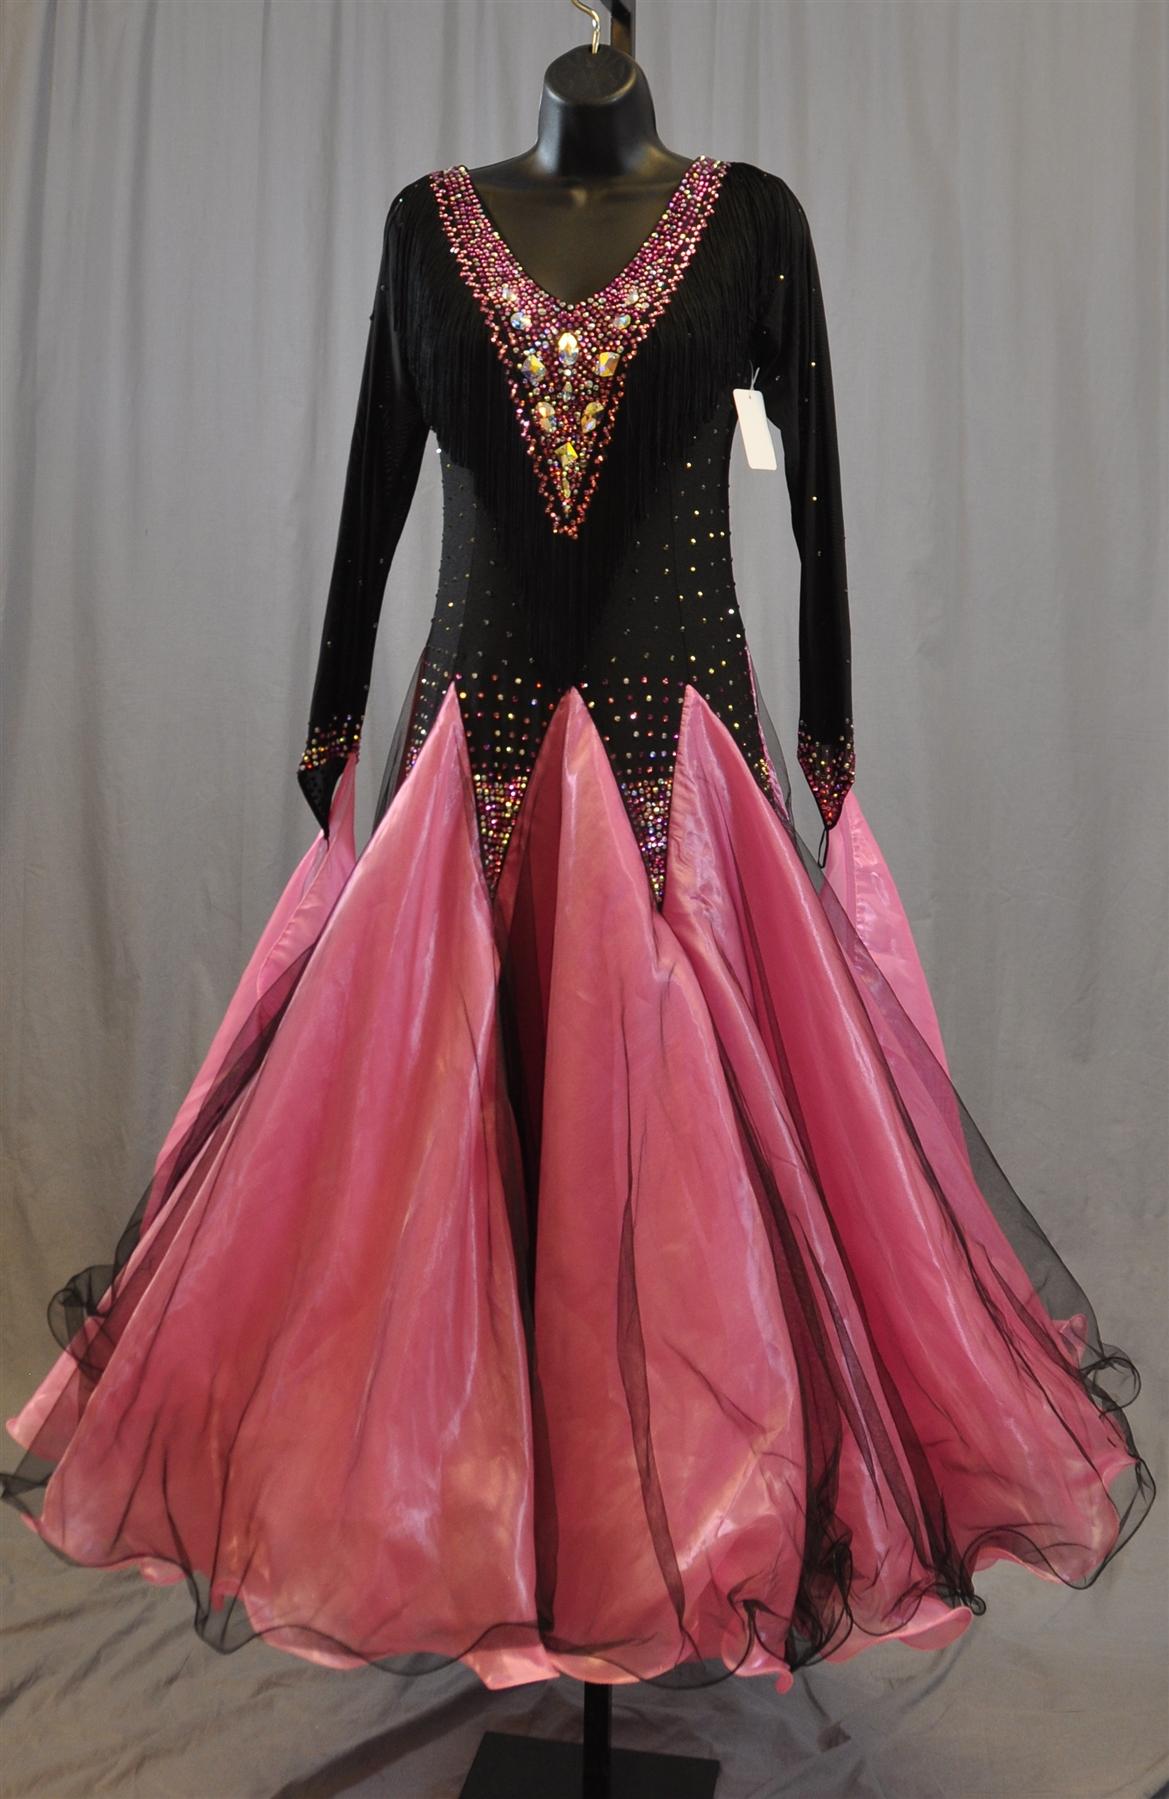 Elegant Black and Pink Long Sleeves Fringe Ballroom Dress